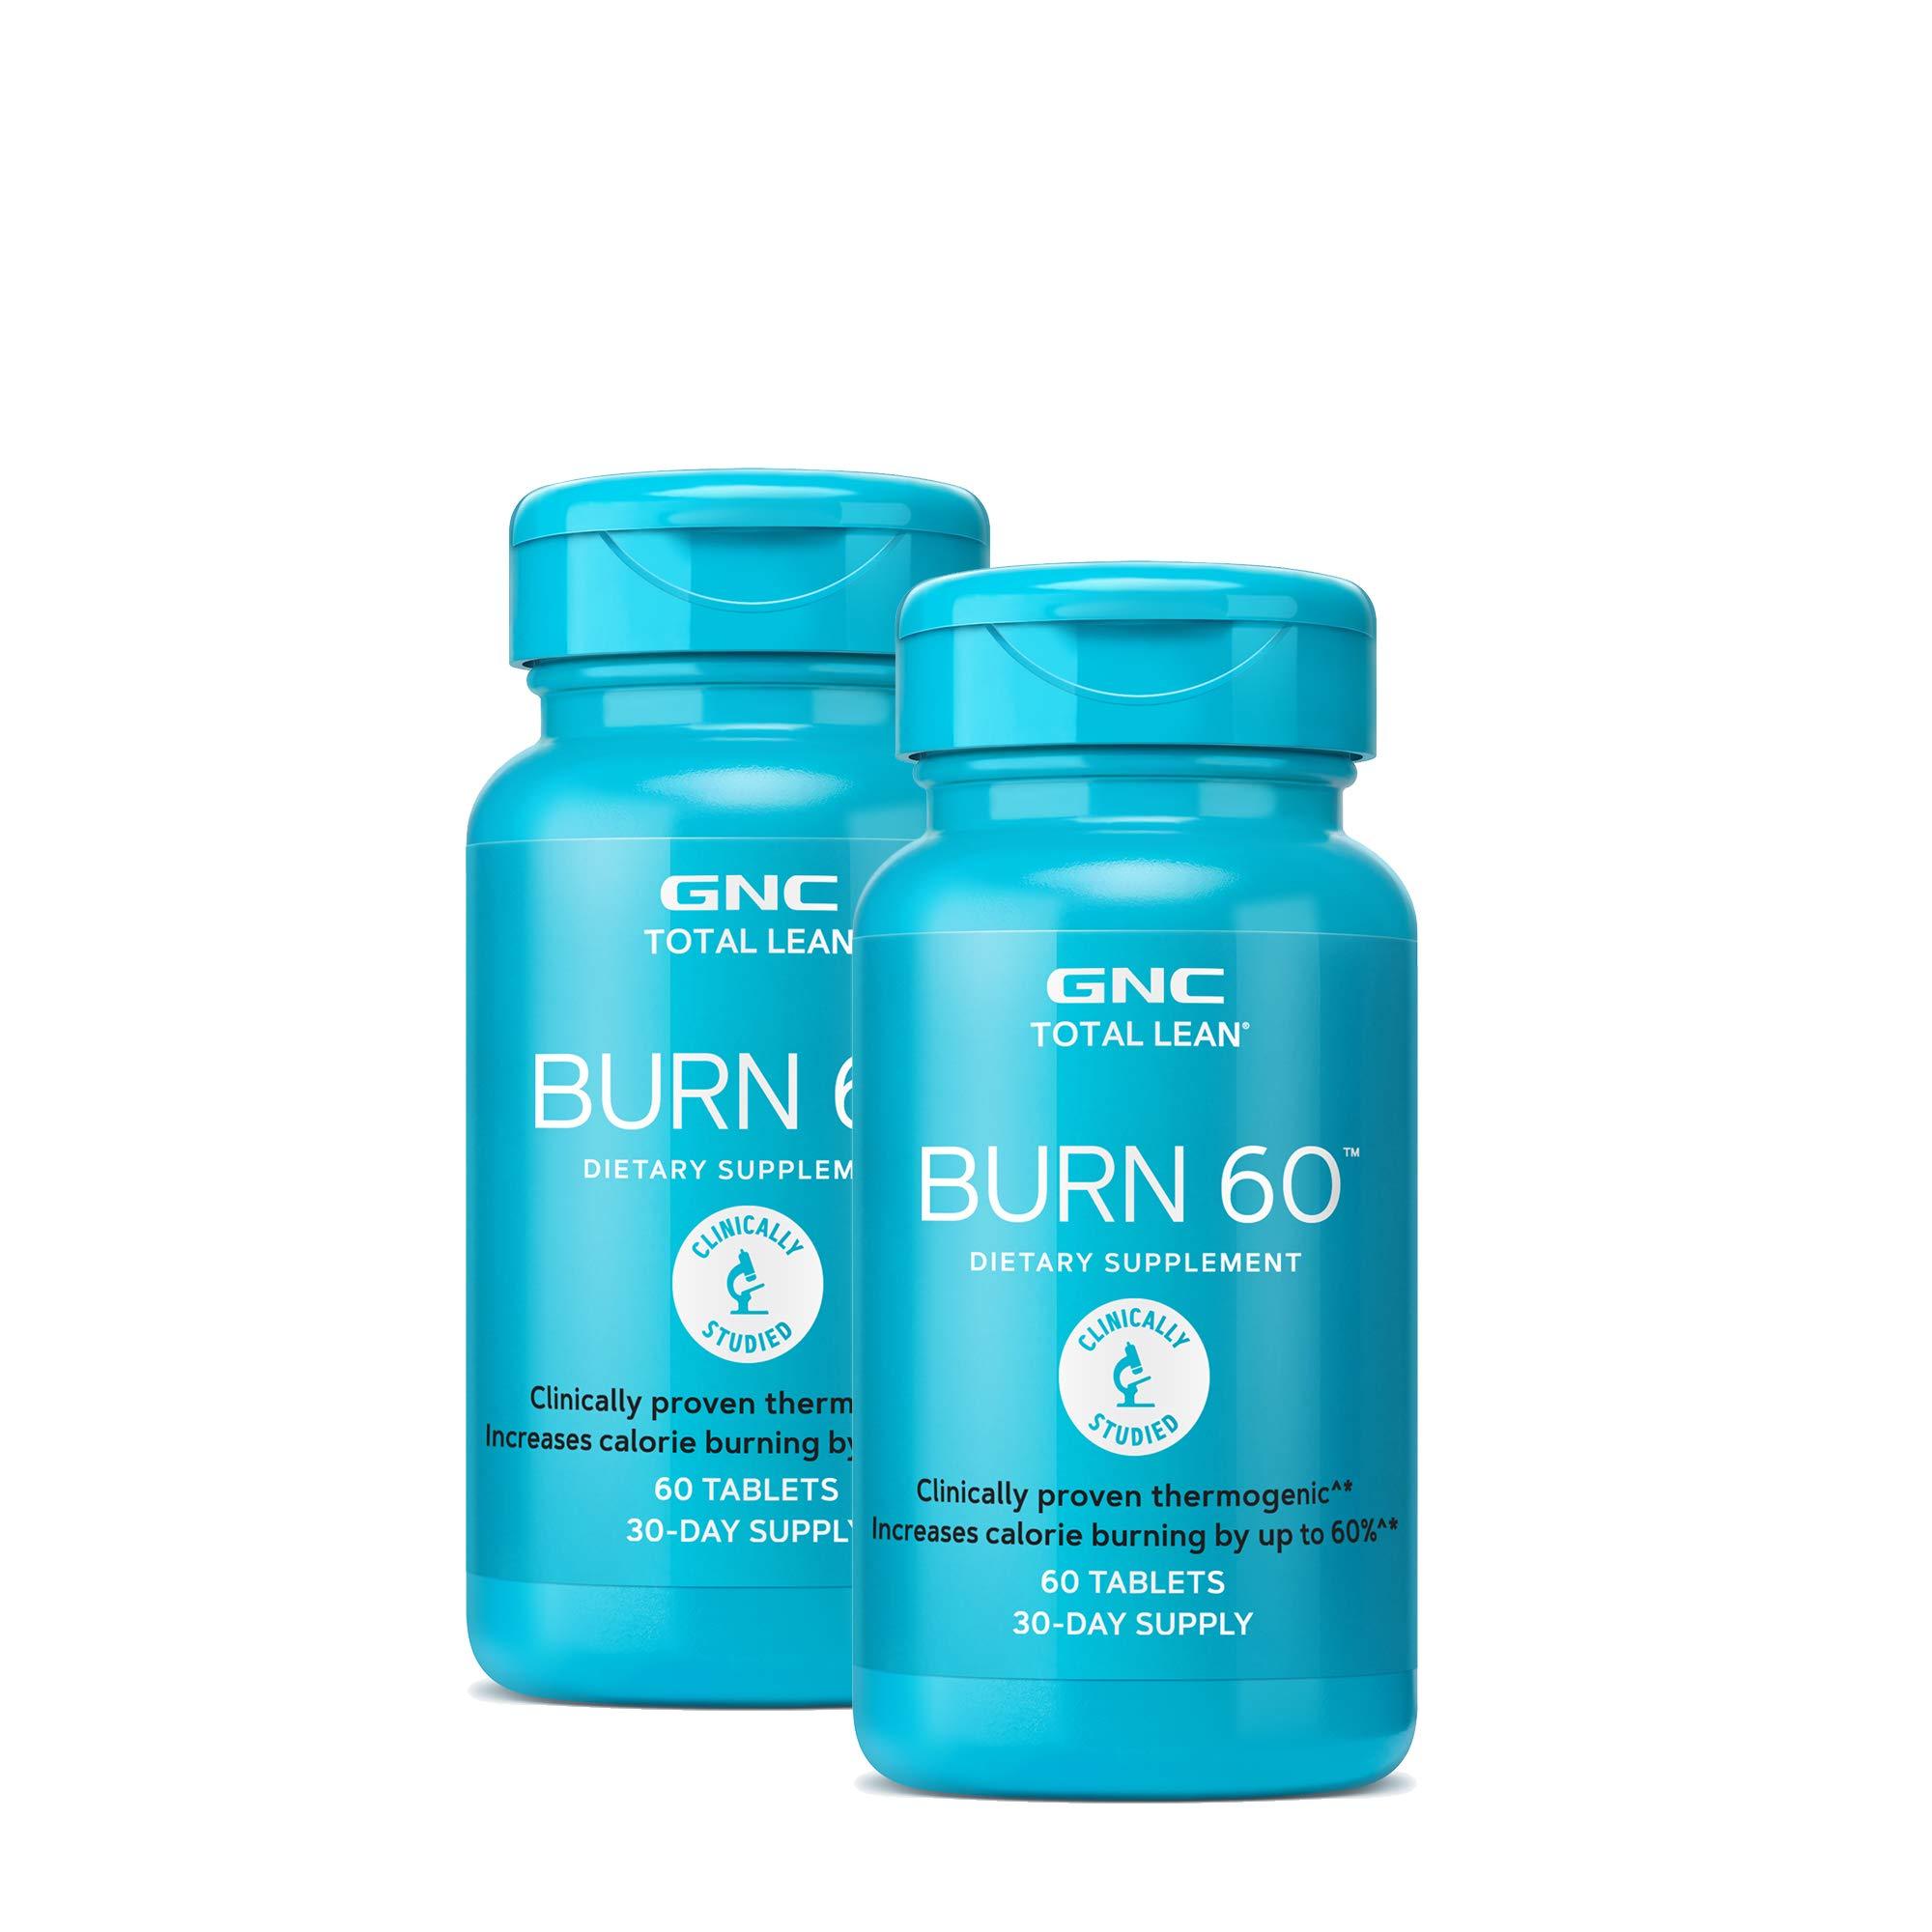 GNC Total Lean Burn 60 - Twin Pack by GNC